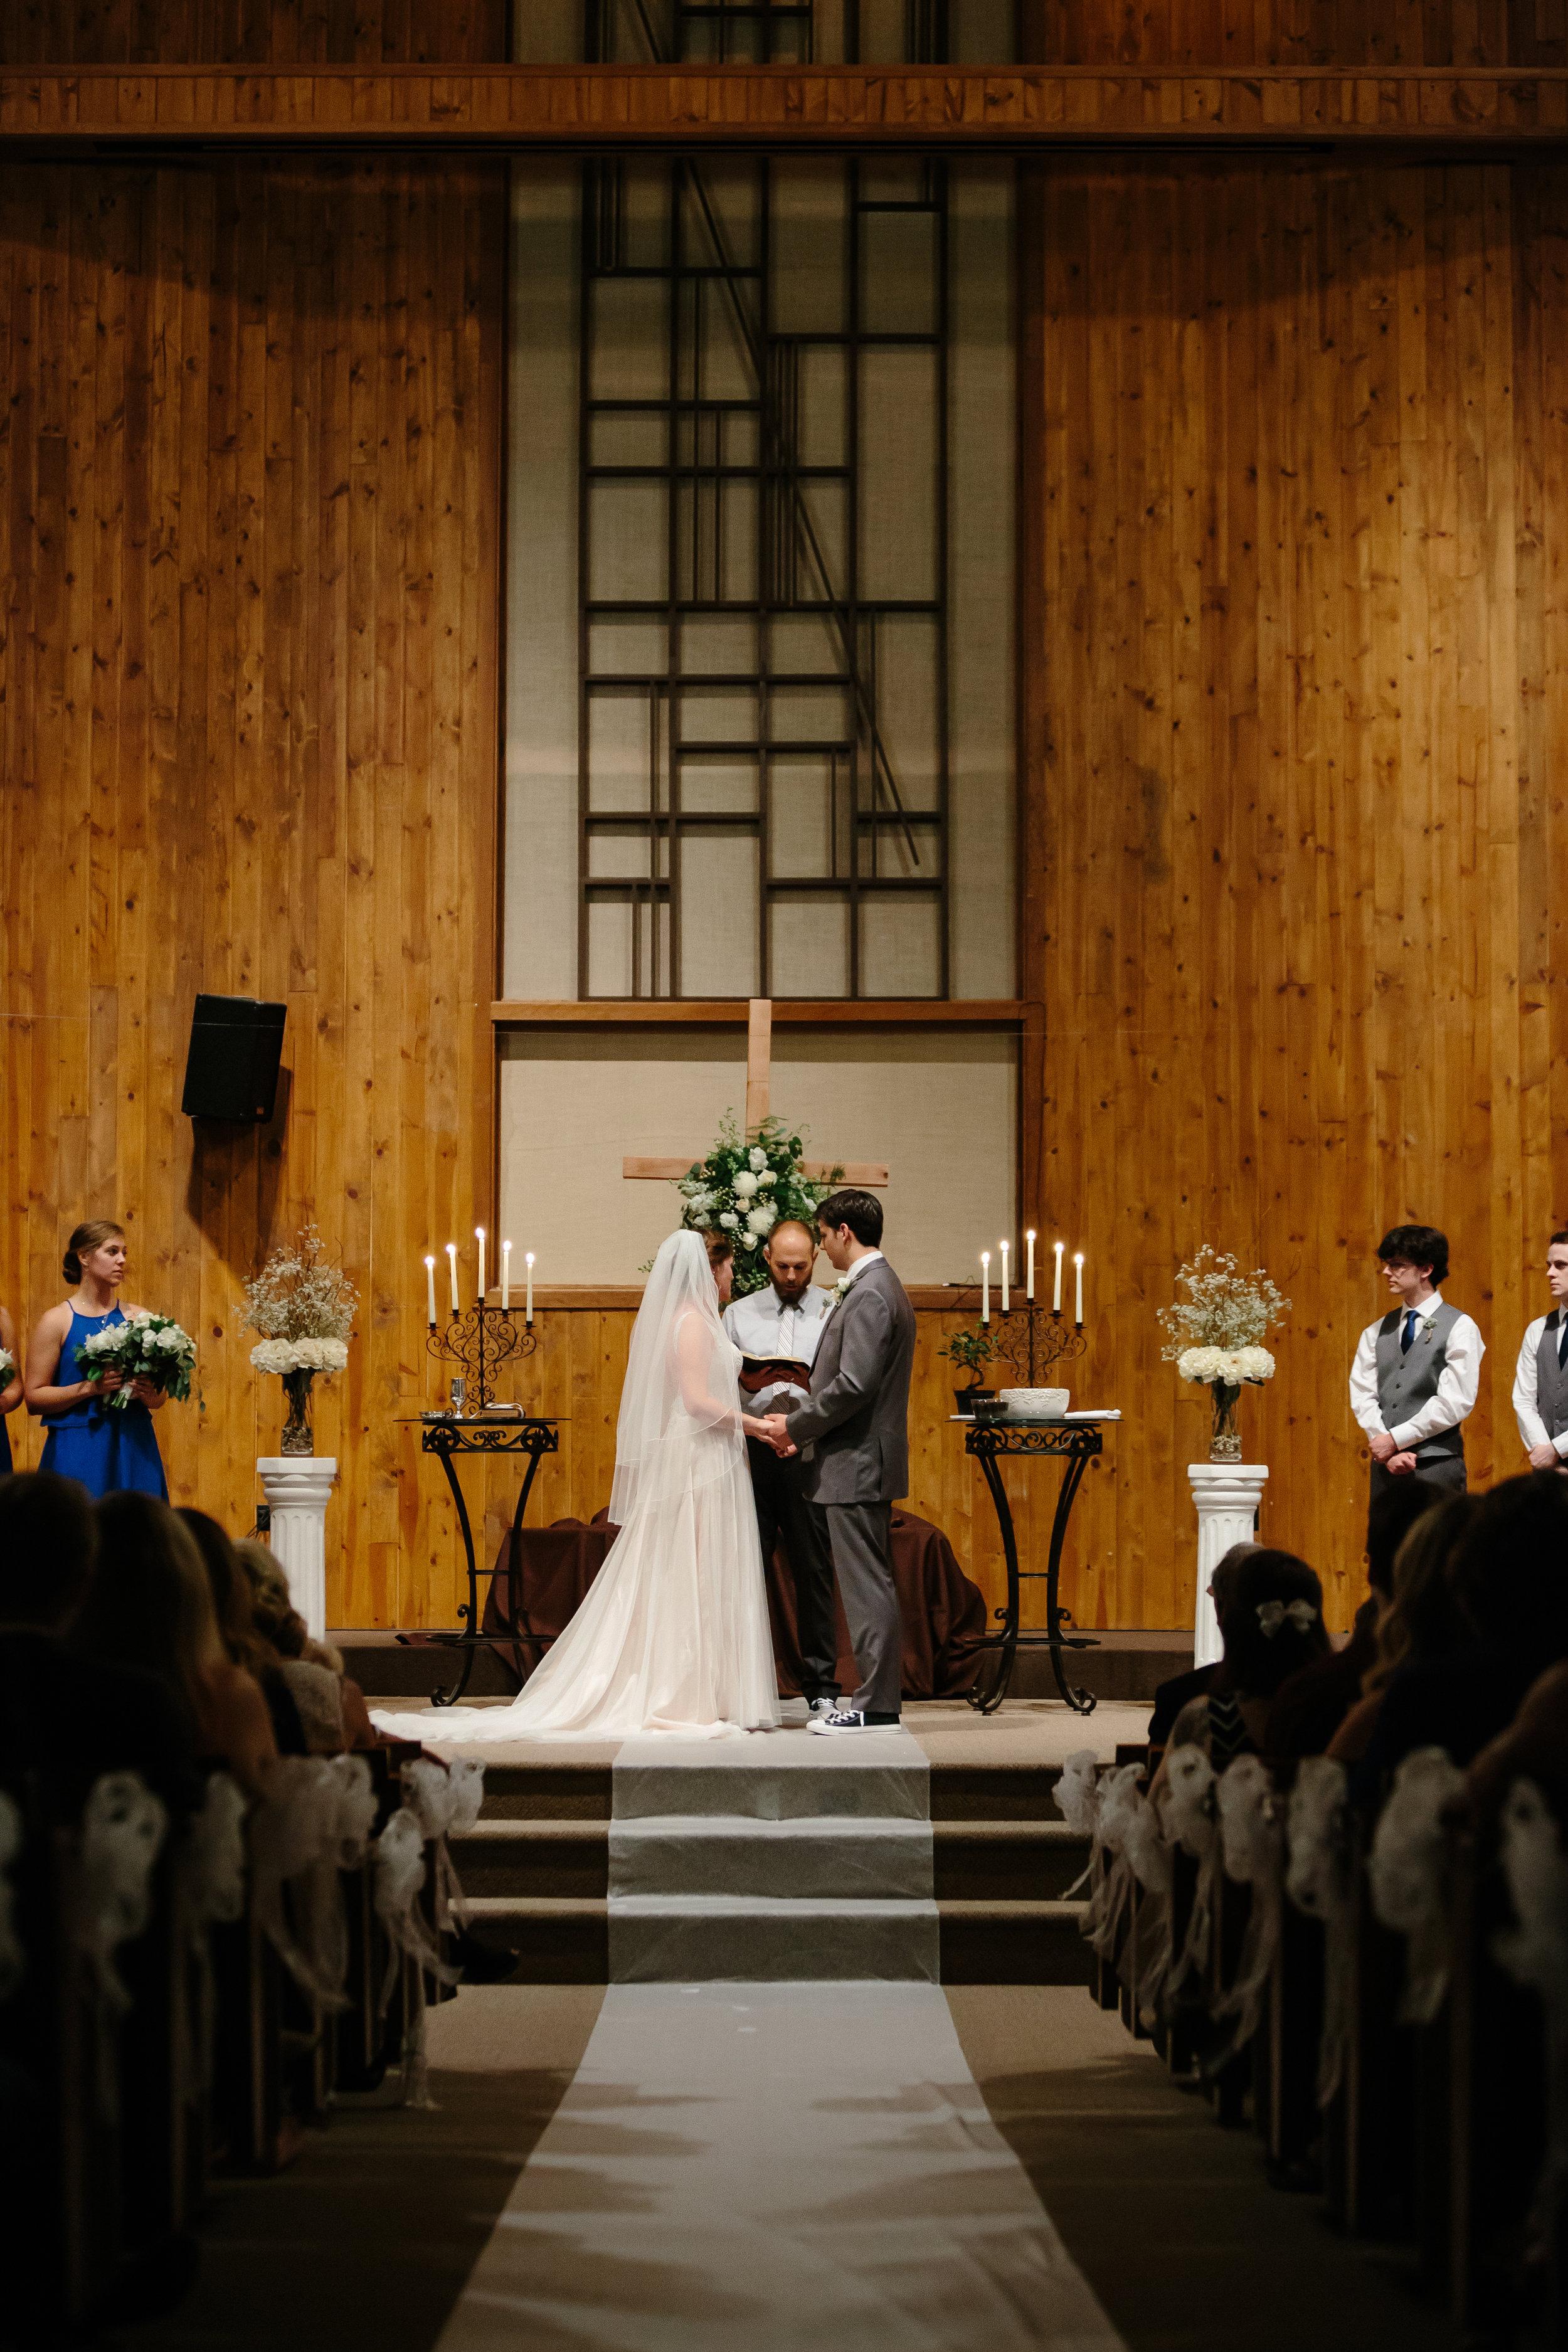 Jordan & Shantel Married - Idaho - Corrie Mick Photography-223.jpg